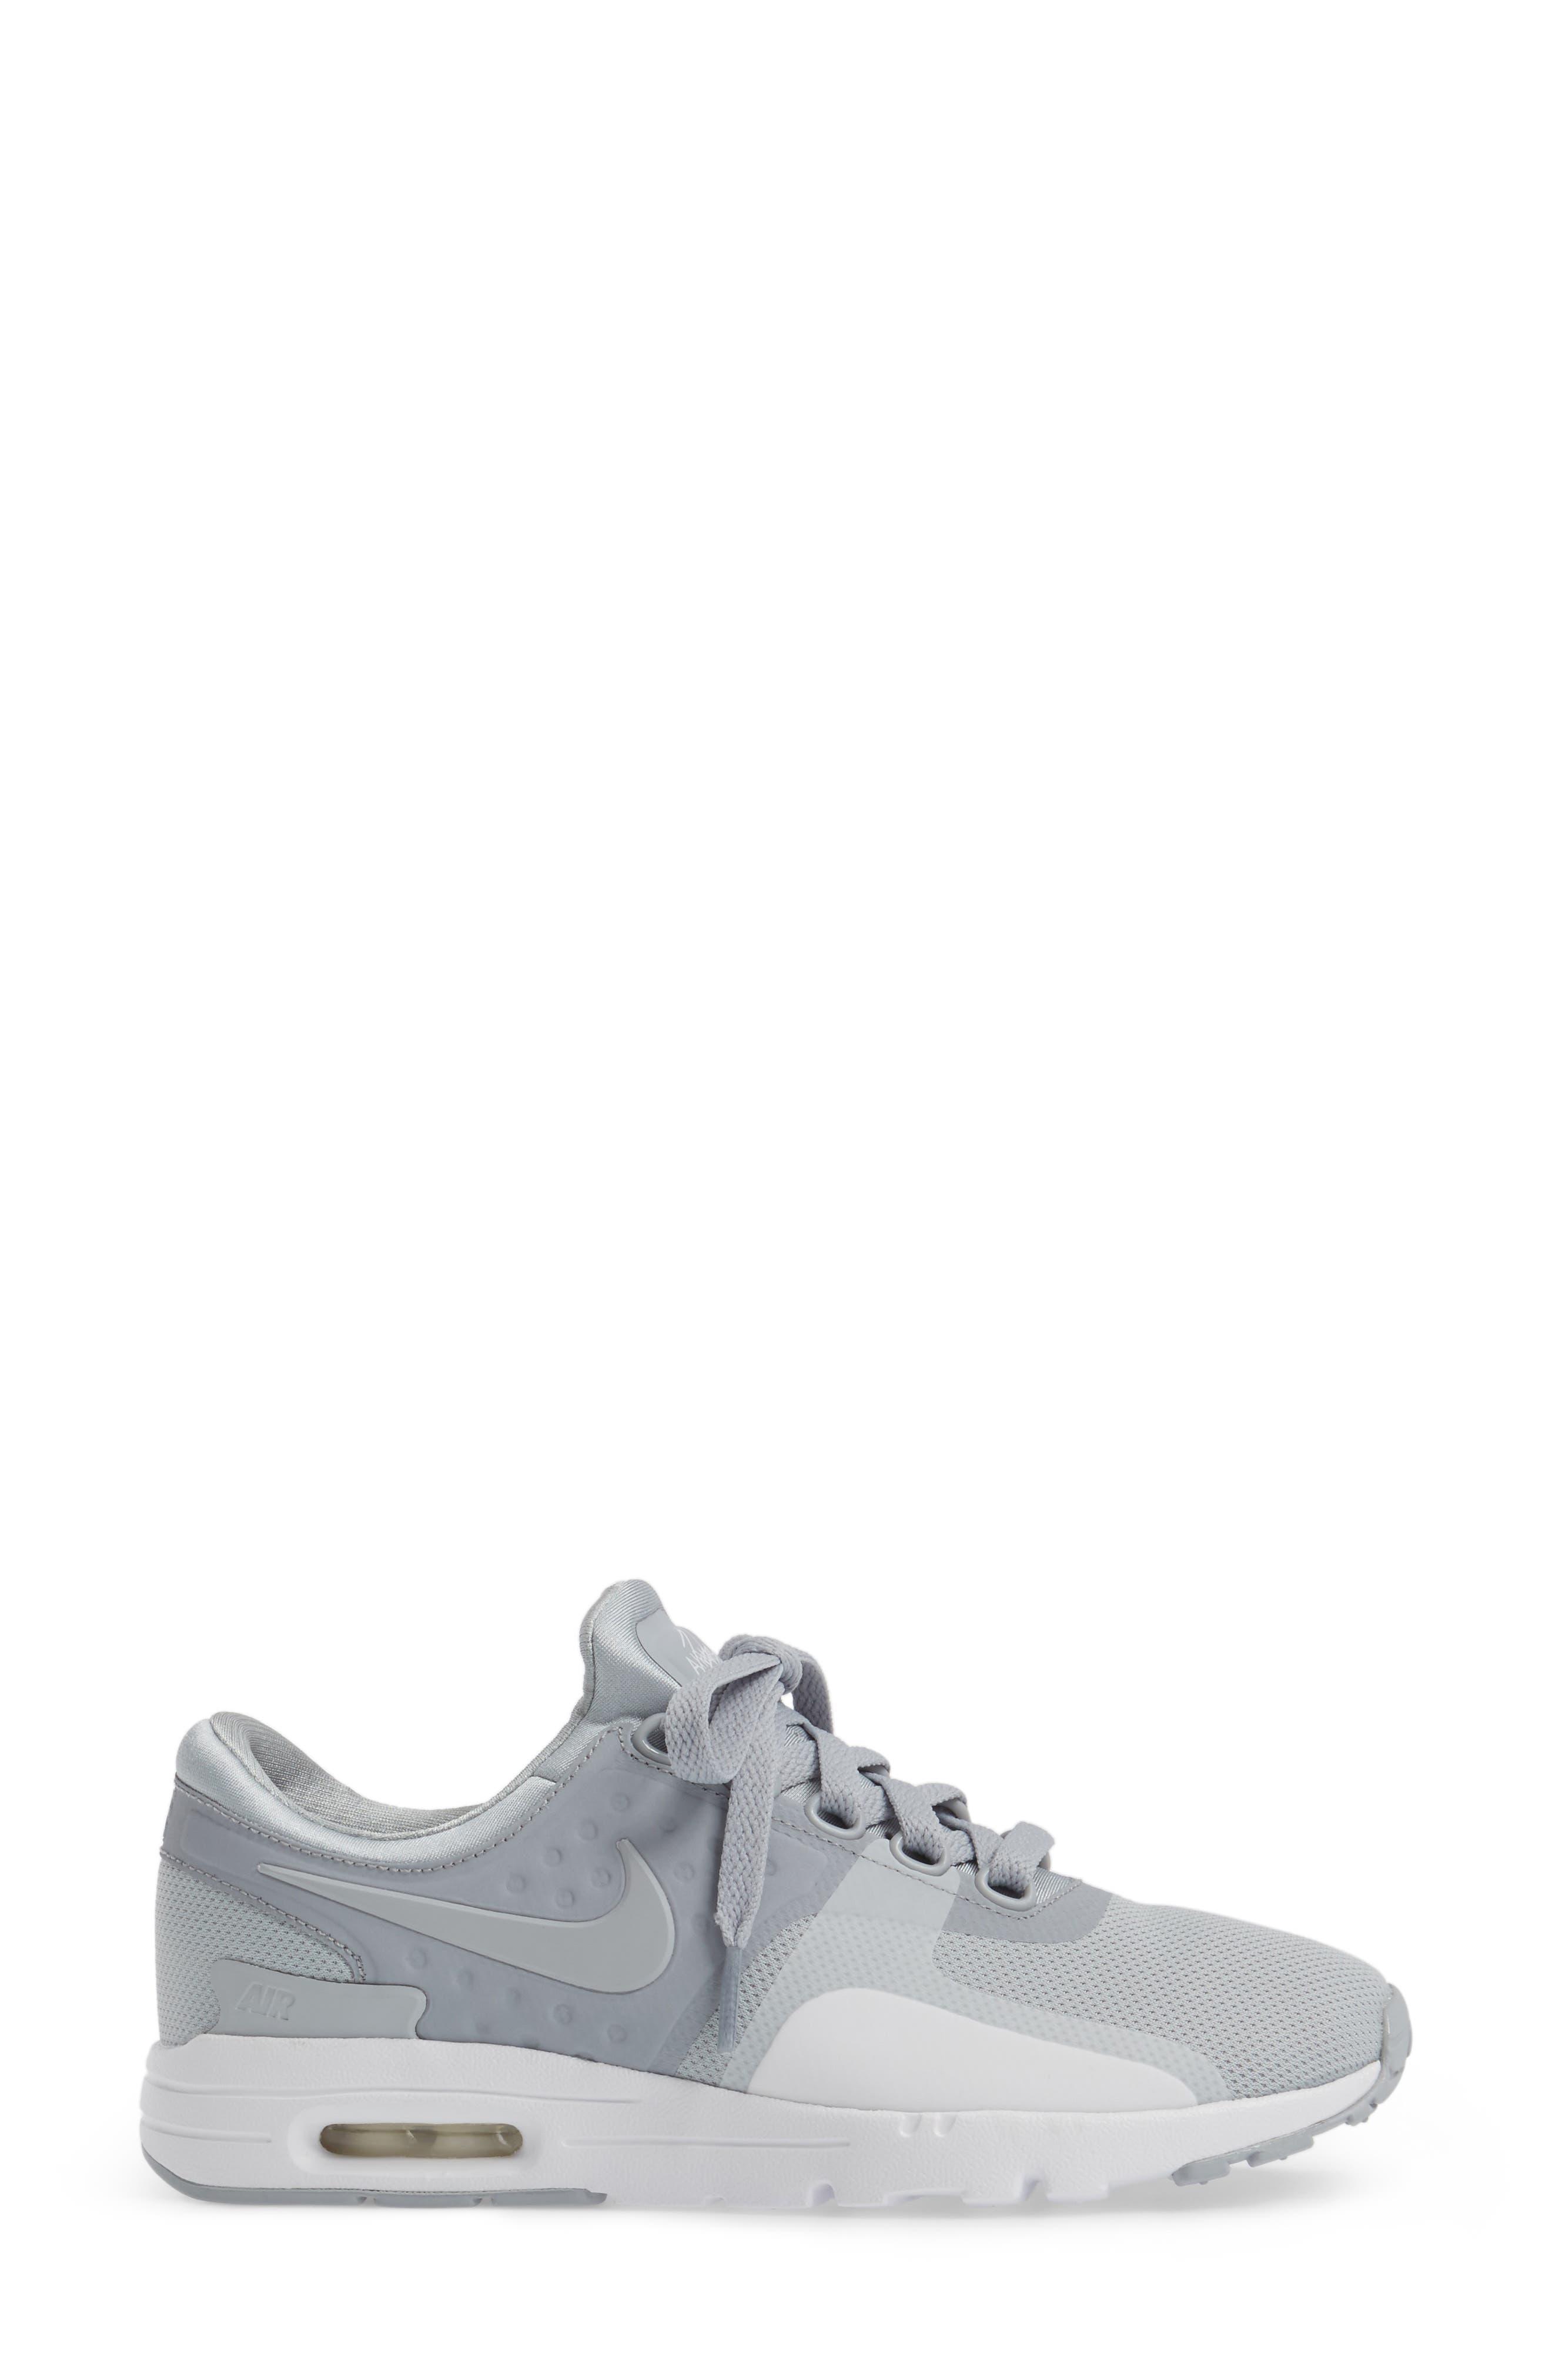 Air Max Zero Sneaker,                             Alternate thumbnail 3, color,                             020